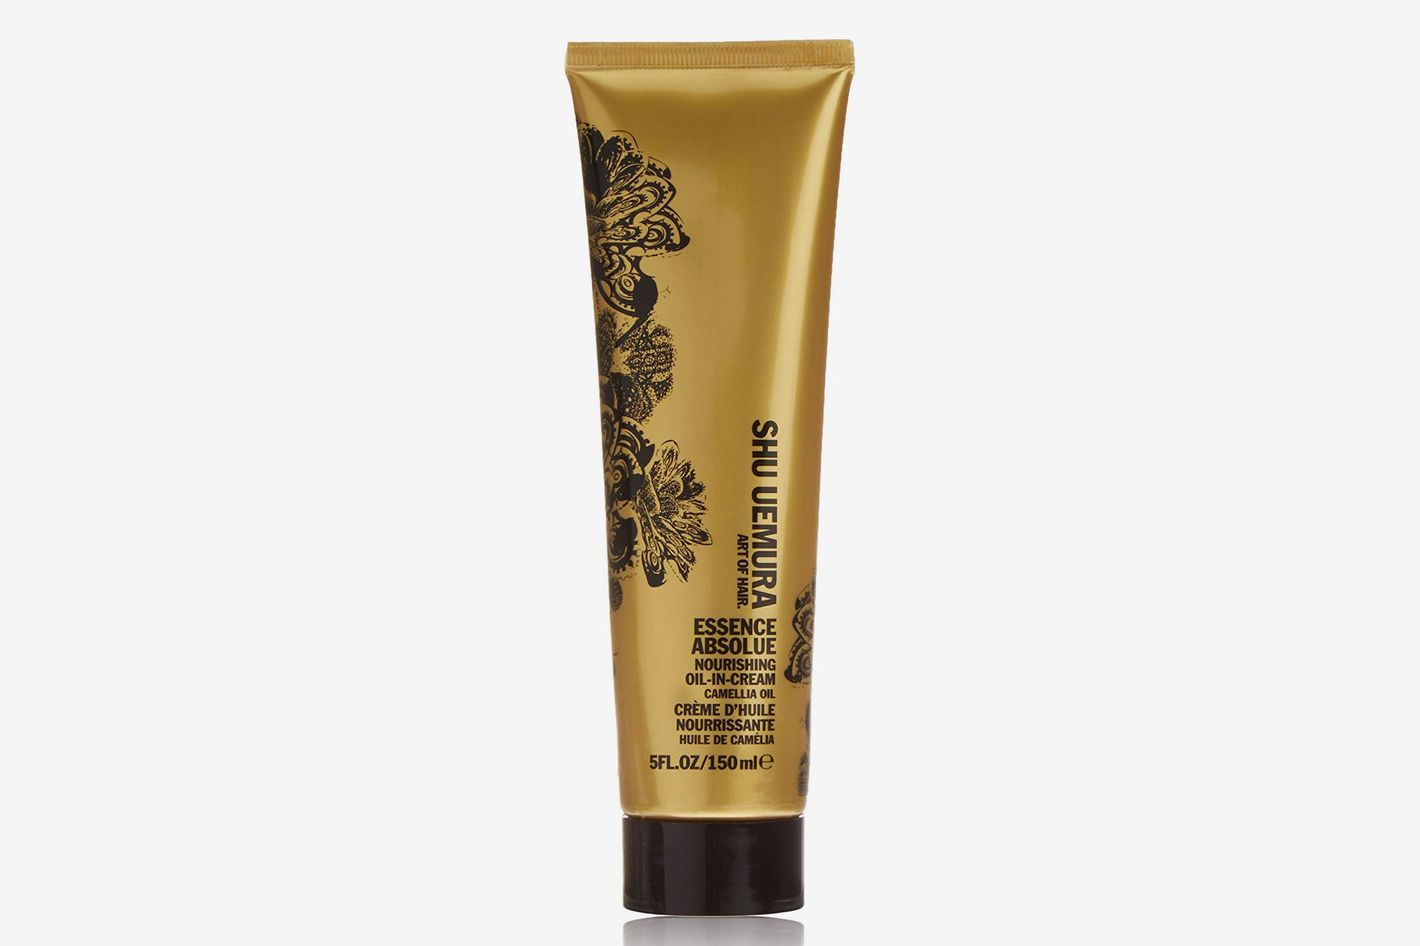 Shu Uemura Essence Absolue Nourishing Oil-in-Cream